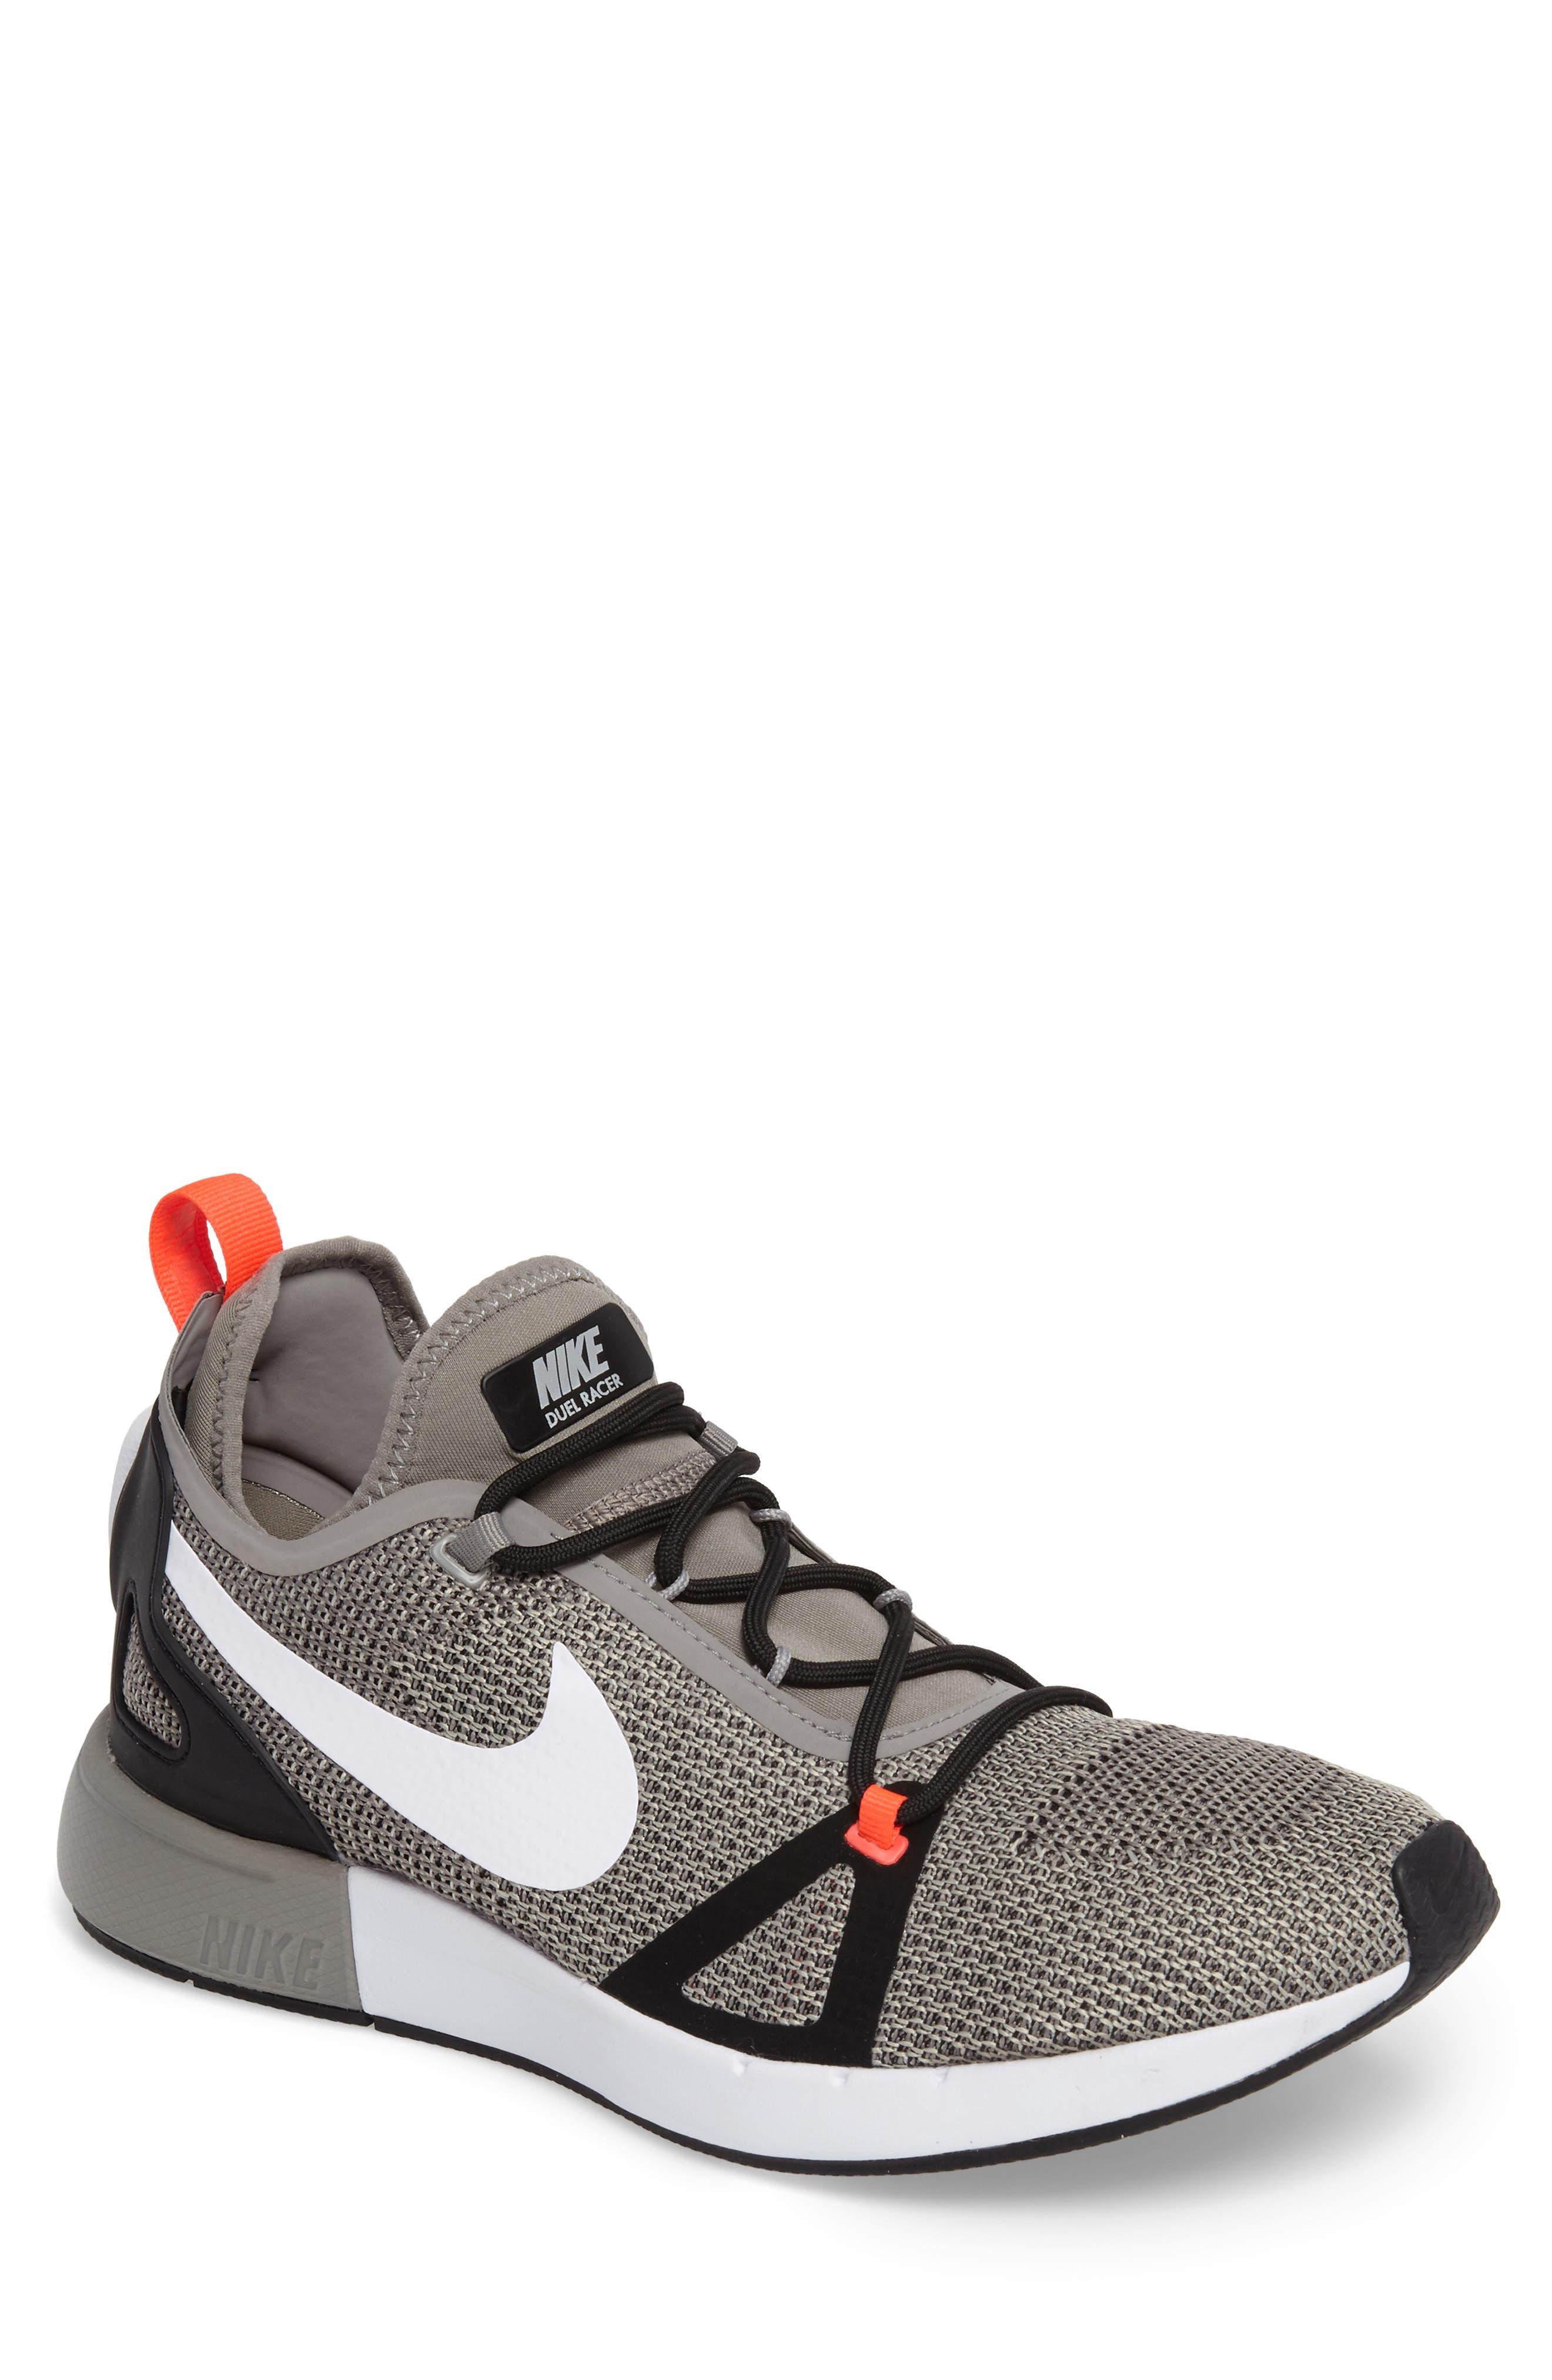 Main Image - Nike Duelist Racer Sneaker (Men)